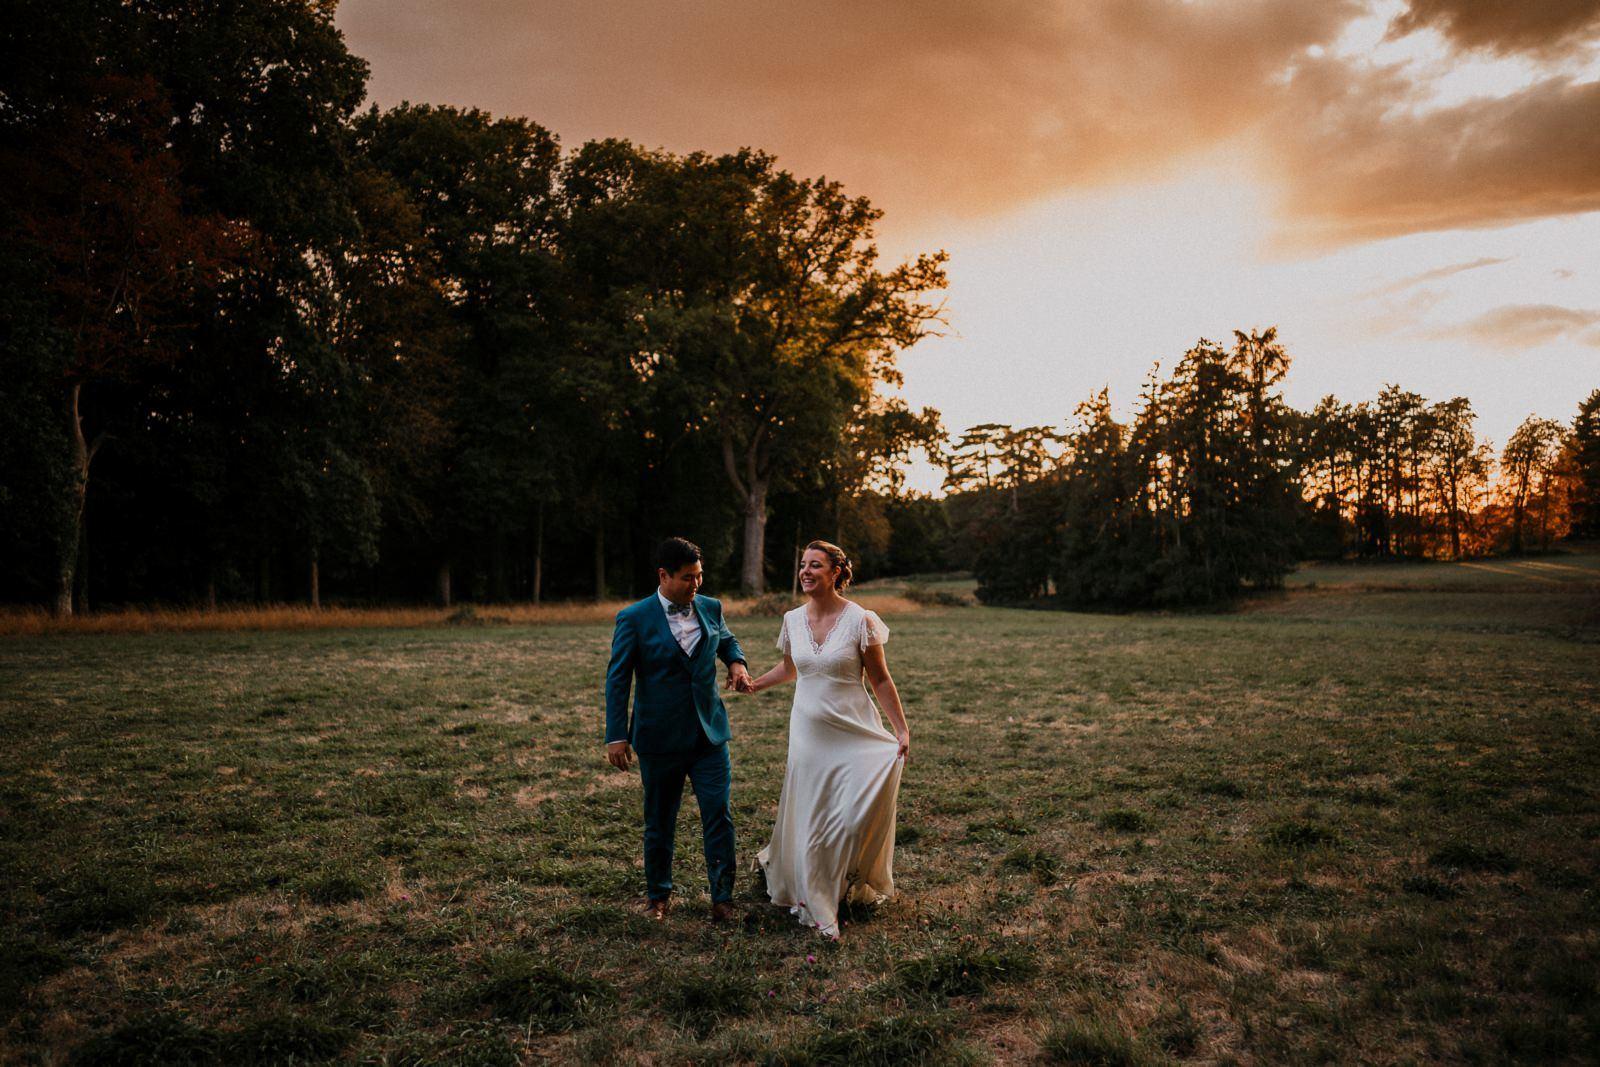 Séance couple de jeunes mariés au château de Courtalain